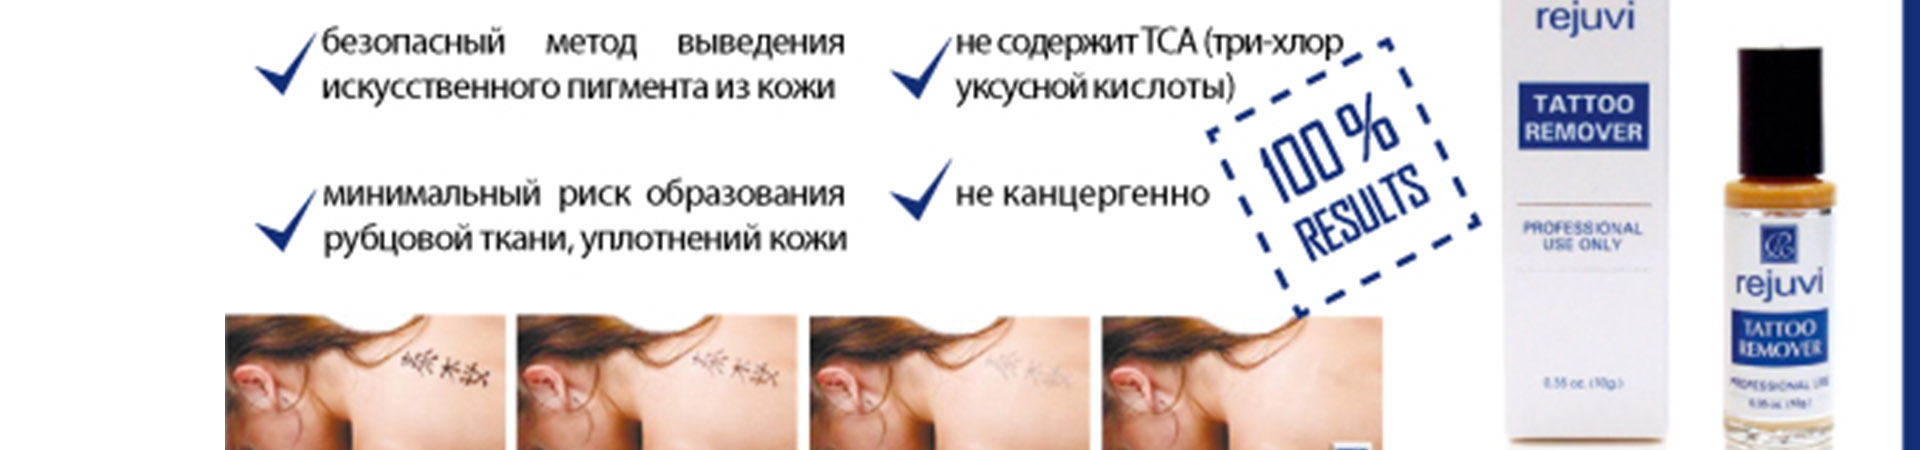 Tattoo Remover